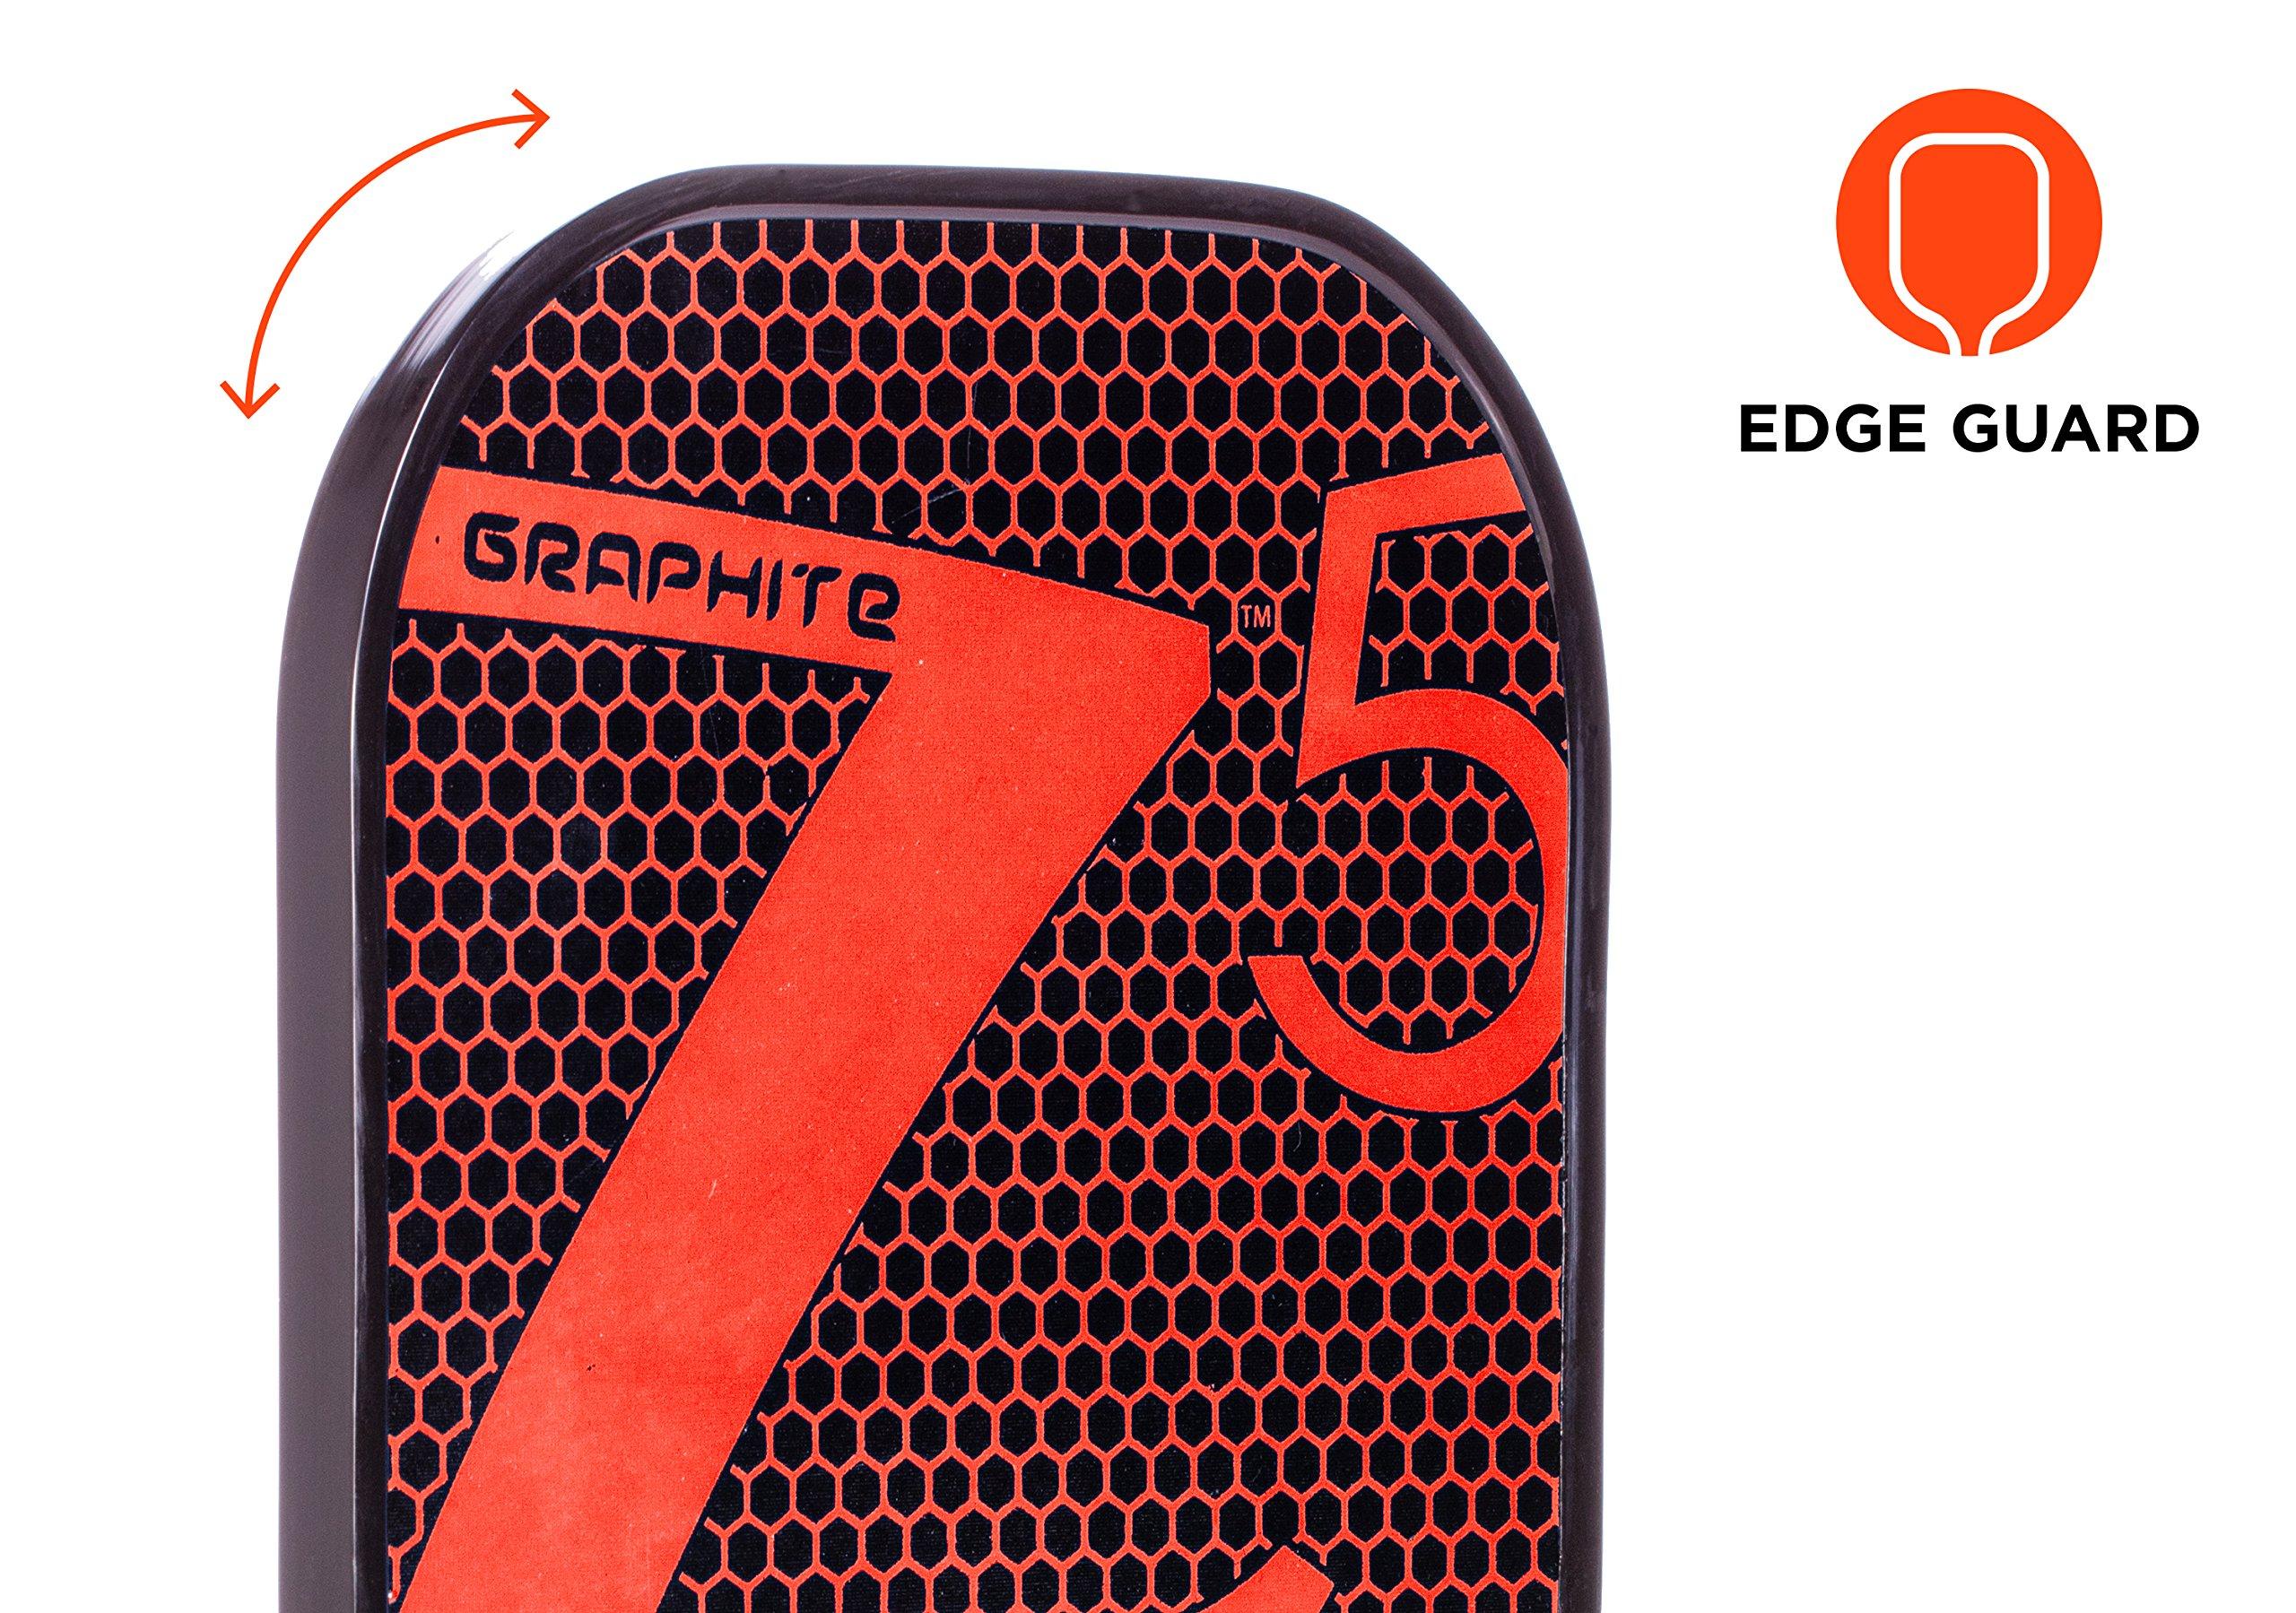 ffa584560c8 Onix Graphite Z5 - Red - KZ1500-RED   Pickleball   Sports   Outdoors - tibs